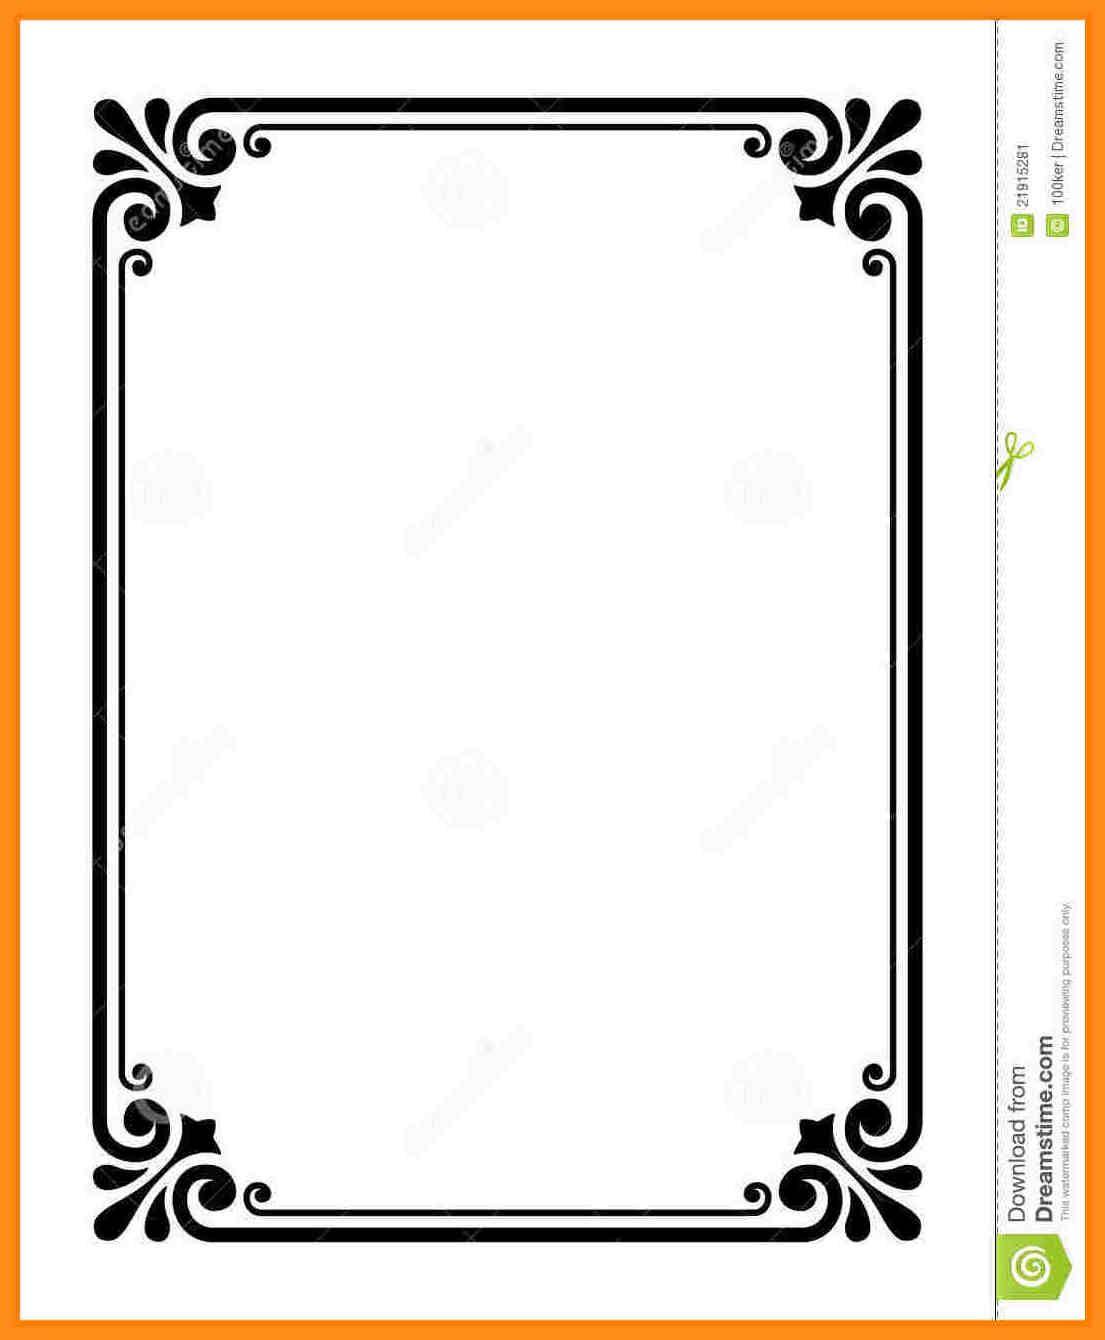 11 Sample Certificate Border Designs